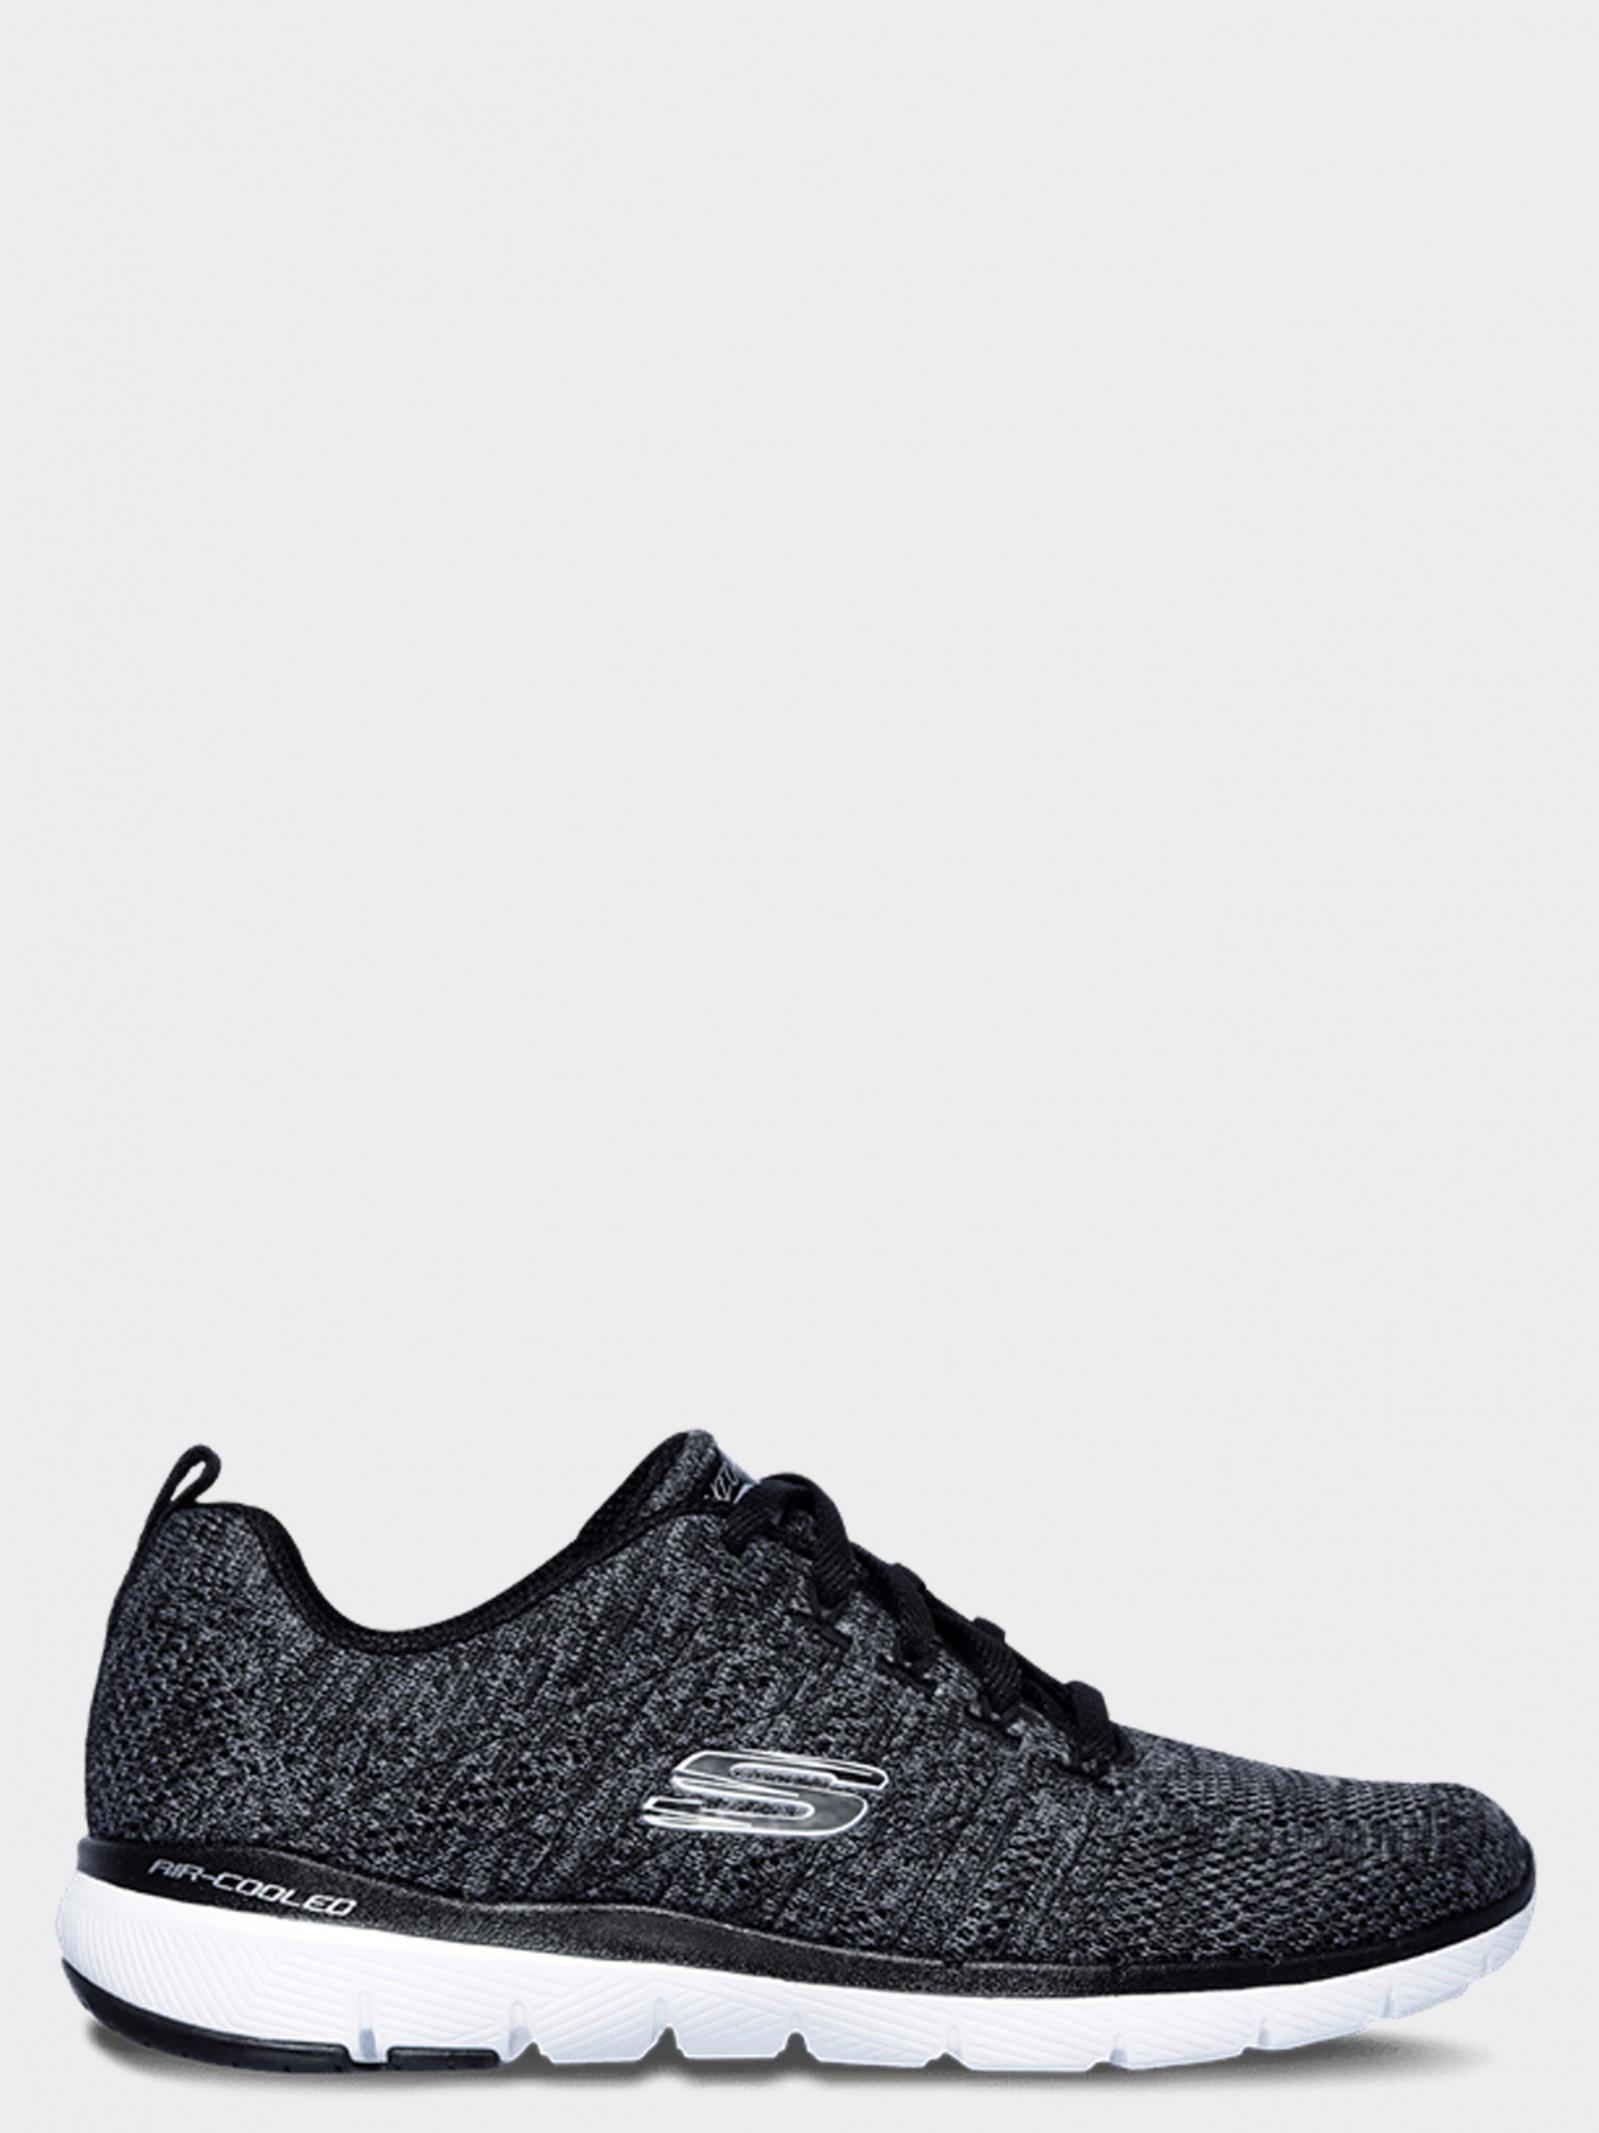 Кроссовки для женщин Skechers KW5159 продажа, 2017